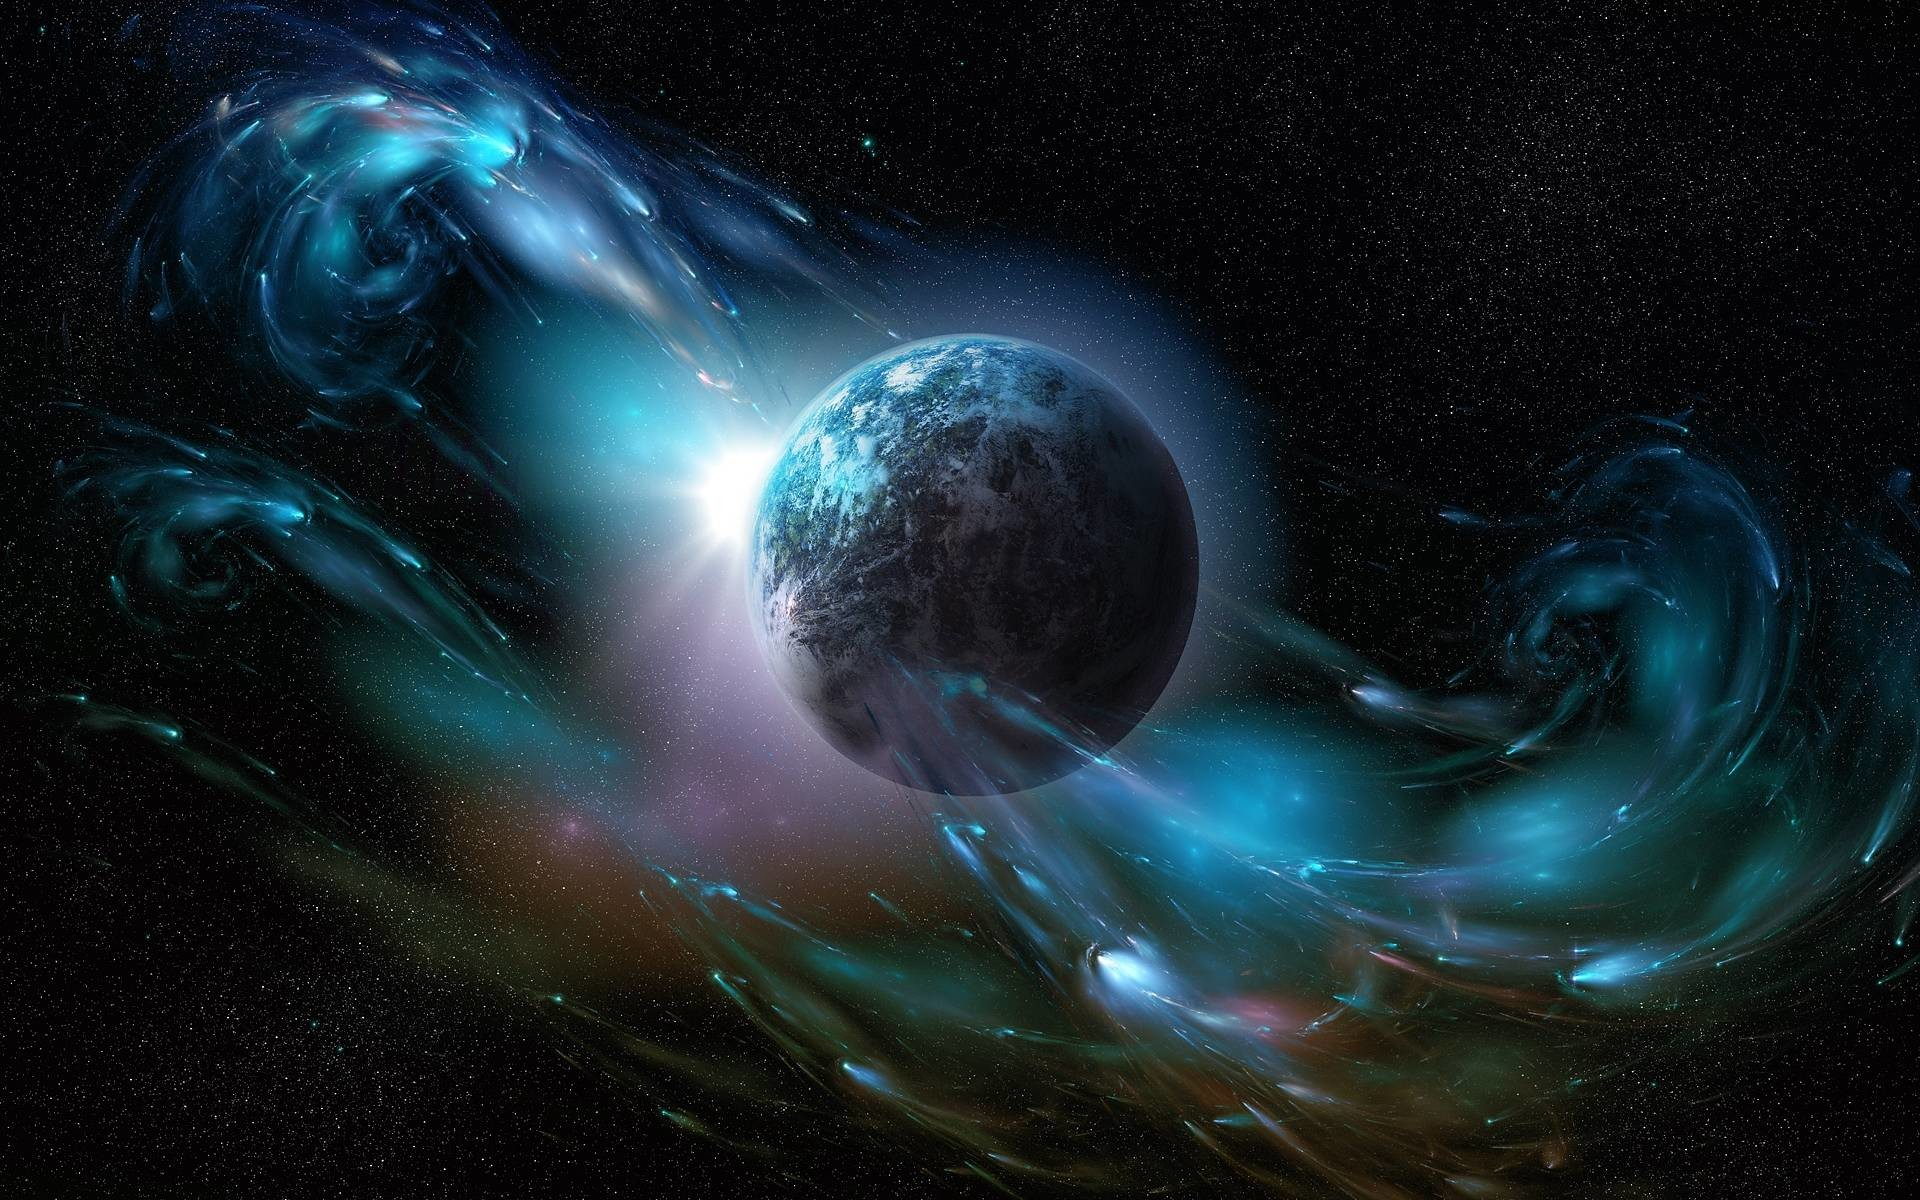 Earth From Outer Space Desktop Wallpaper – HDwallshare.com